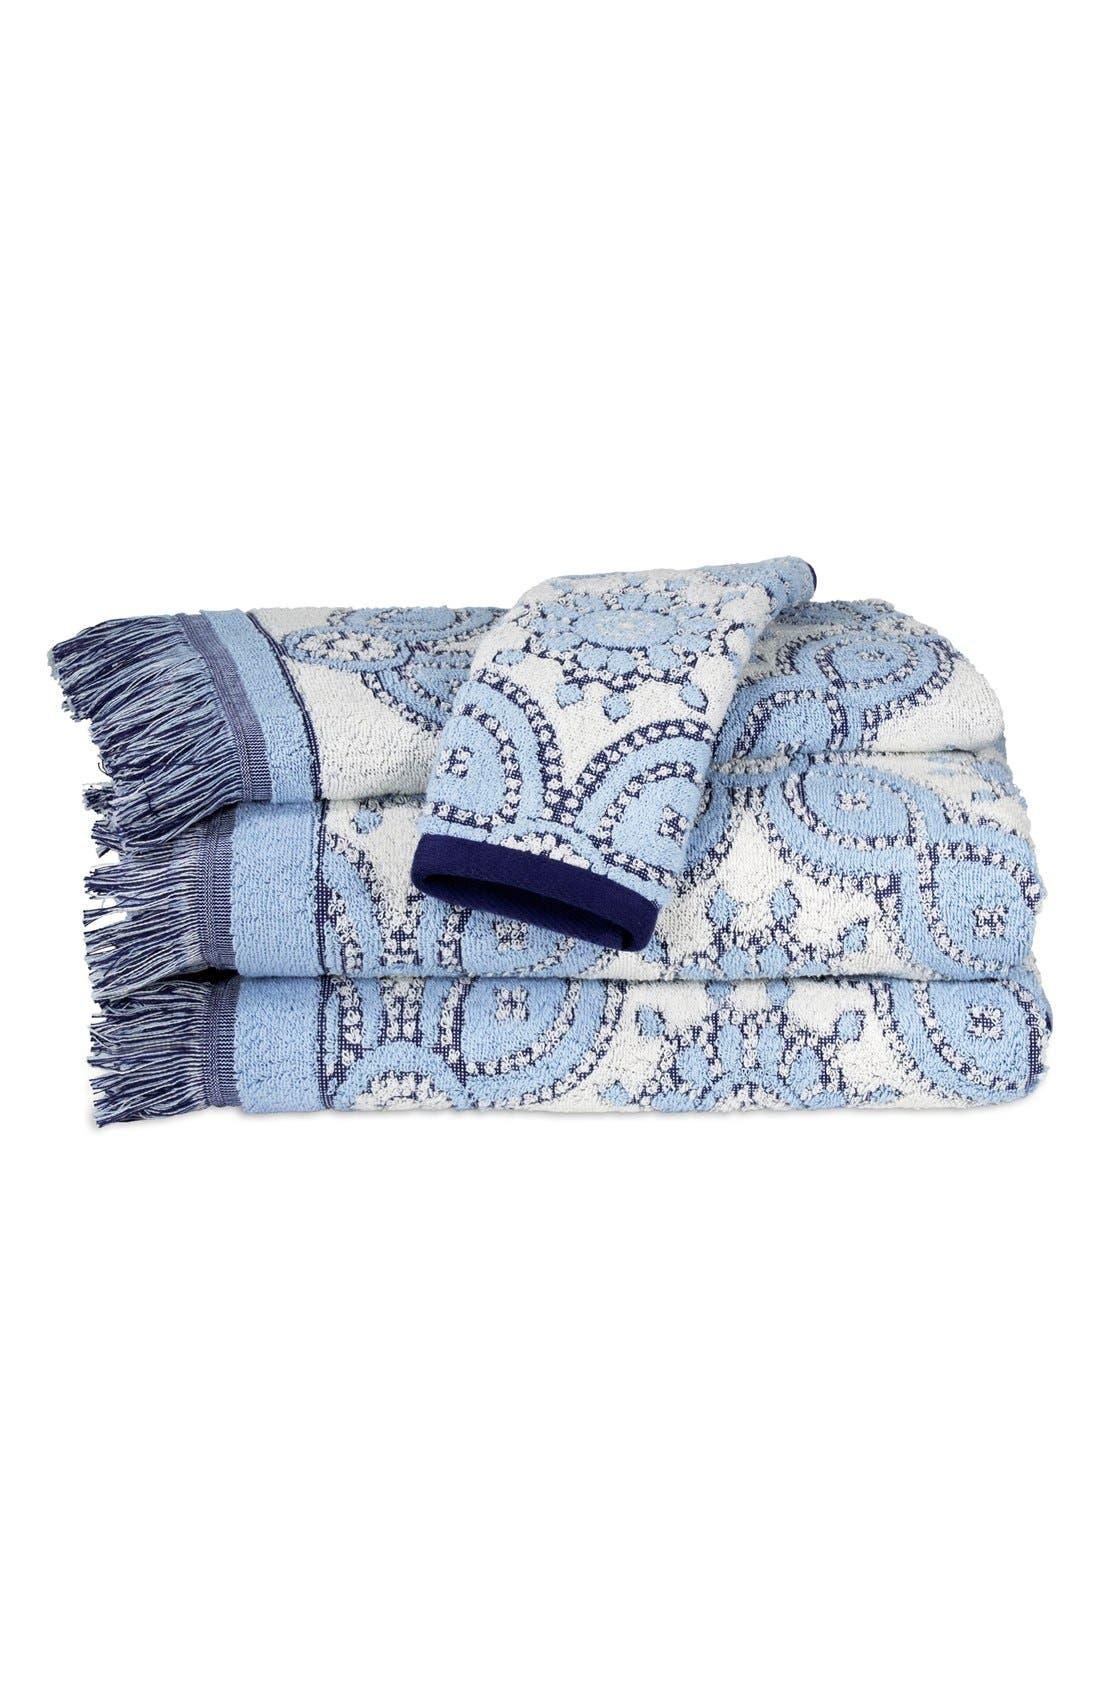 Main Image - John Robshaw 'Petra' Cotton Bath Towel